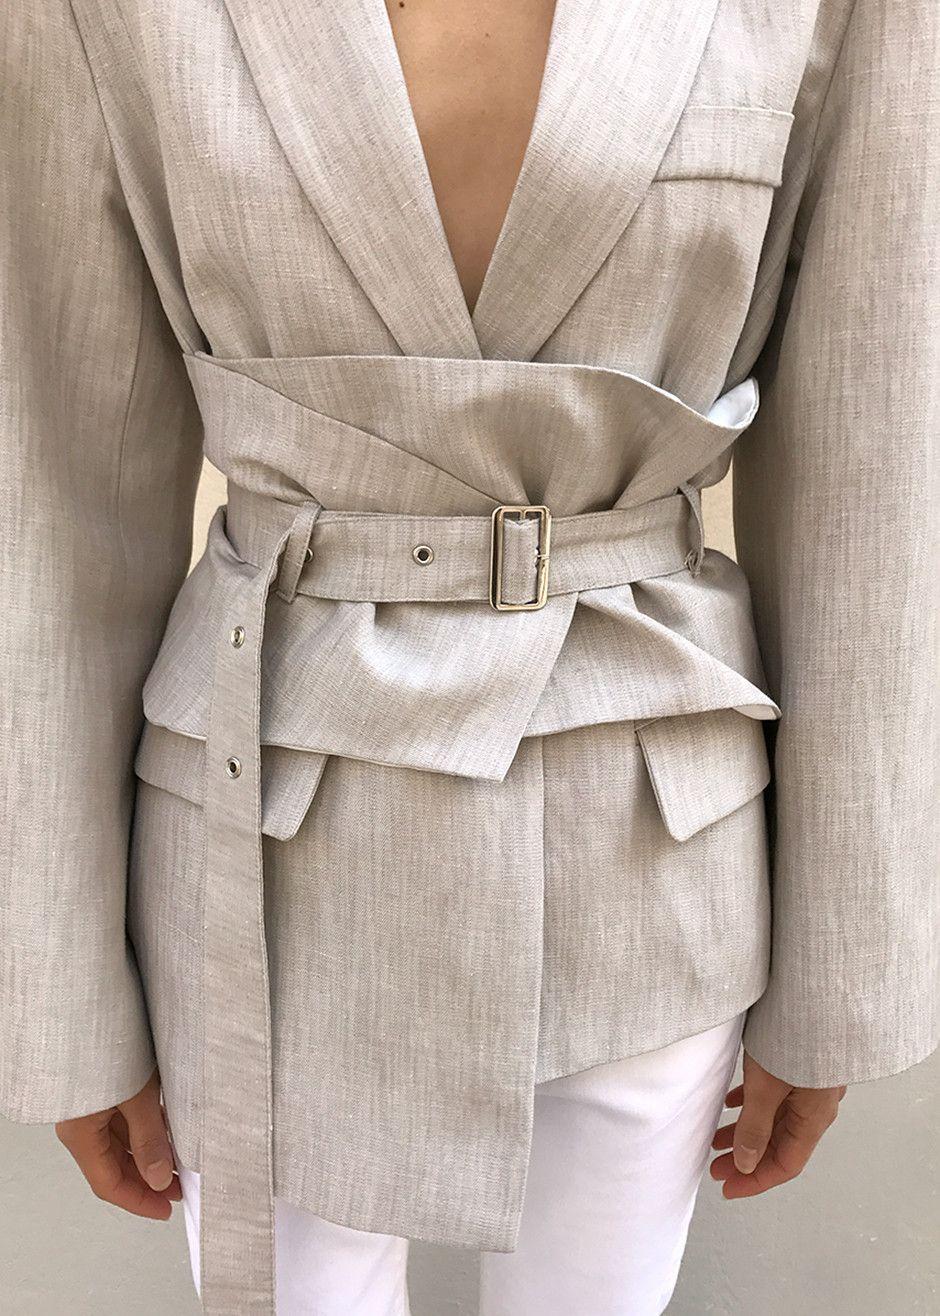 veste blazer en lin cru ceintur e tendance mode femme. Black Bedroom Furniture Sets. Home Design Ideas